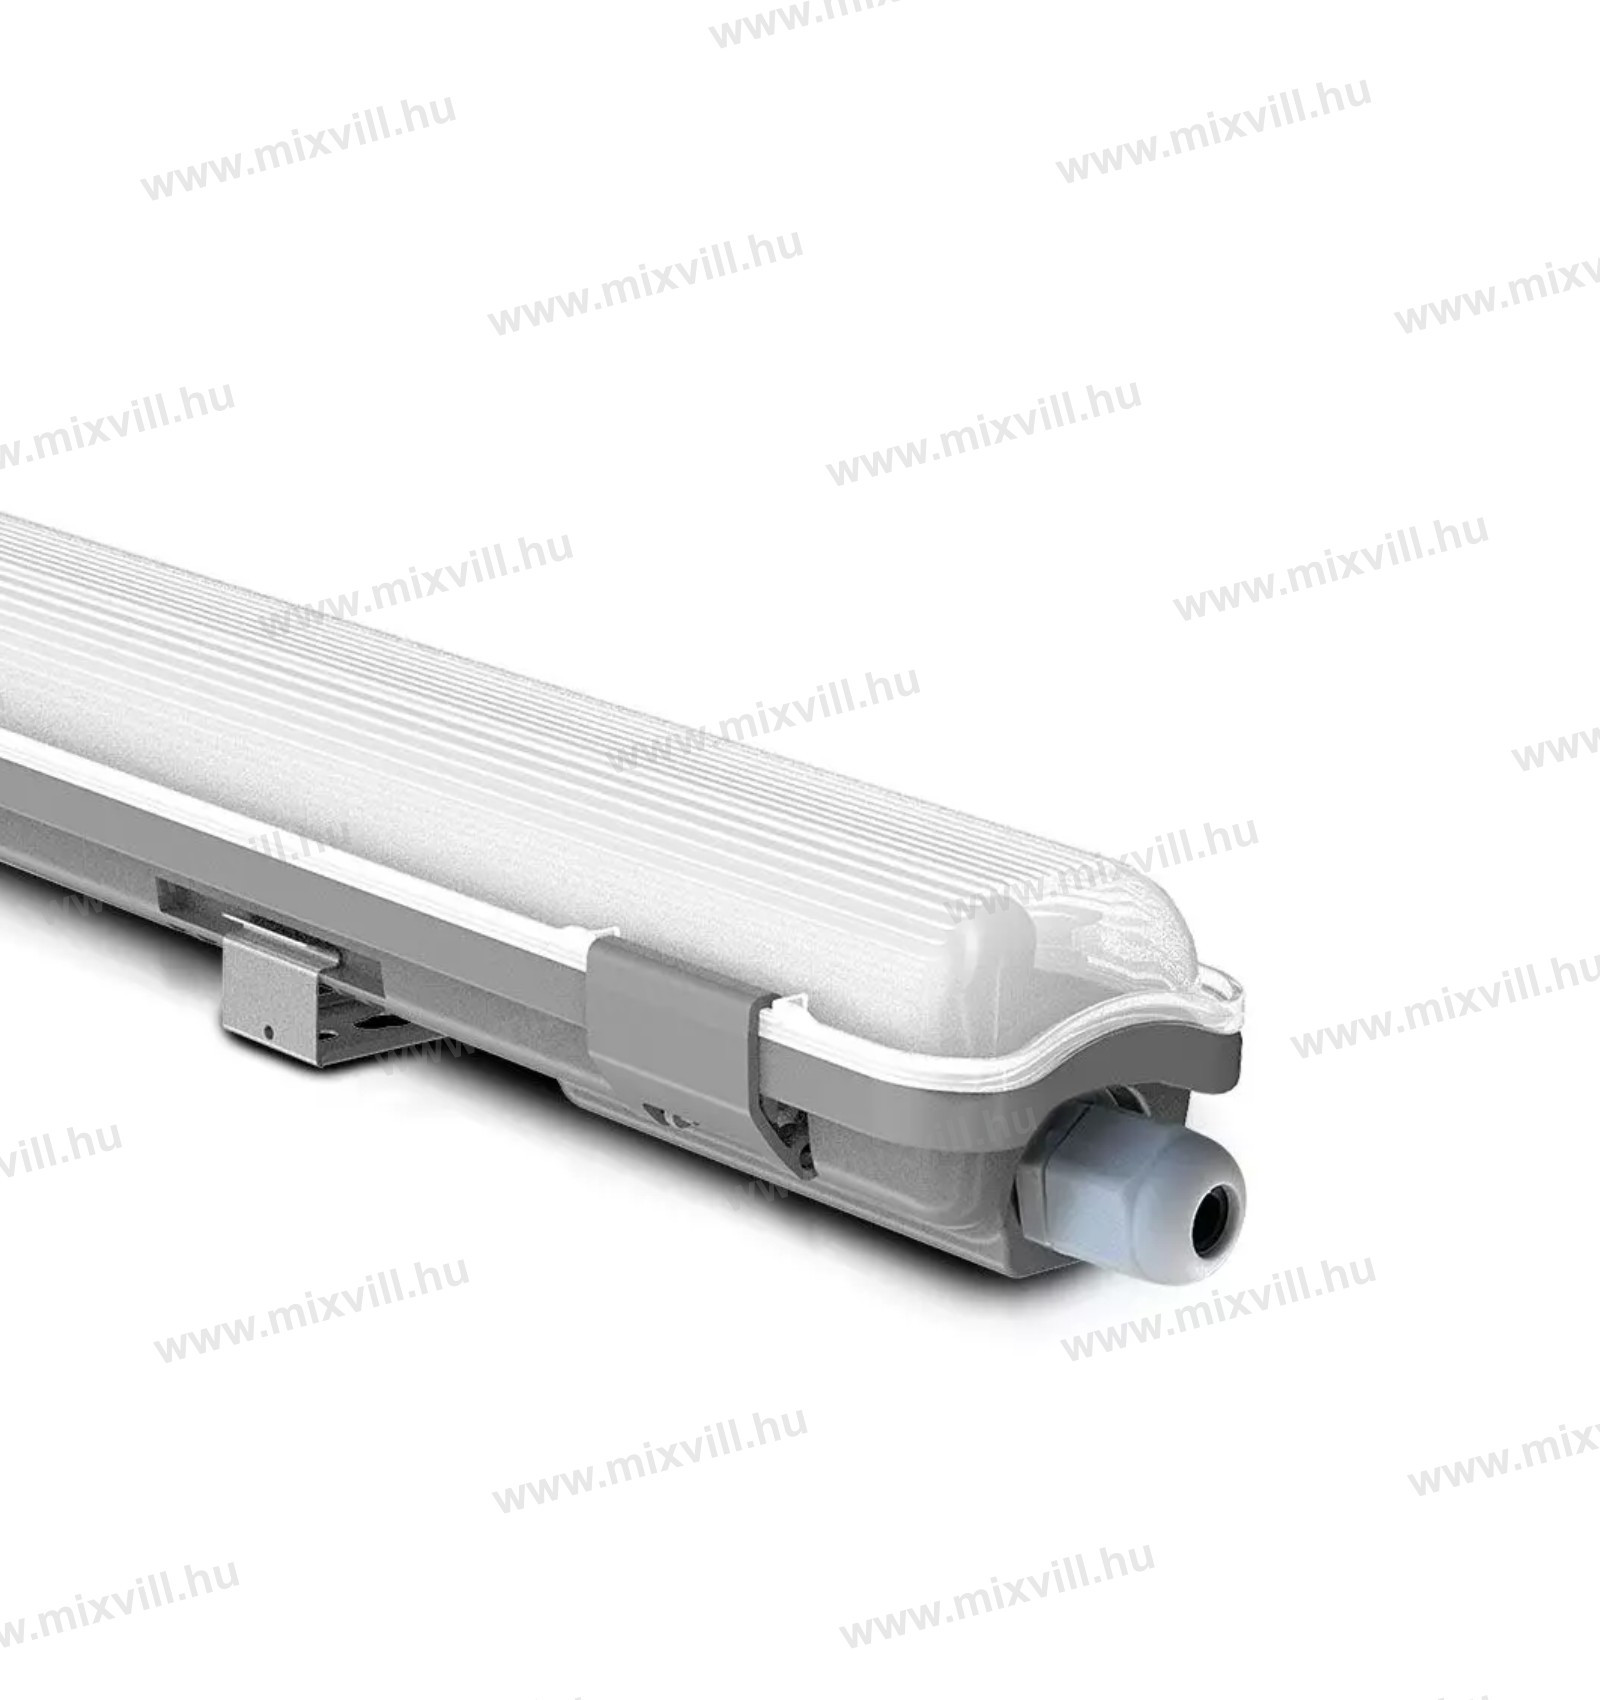 sku-6465-v-tac-led-kulteri-paramentes-vizallo-lampa-2x10w-60cm-armatura